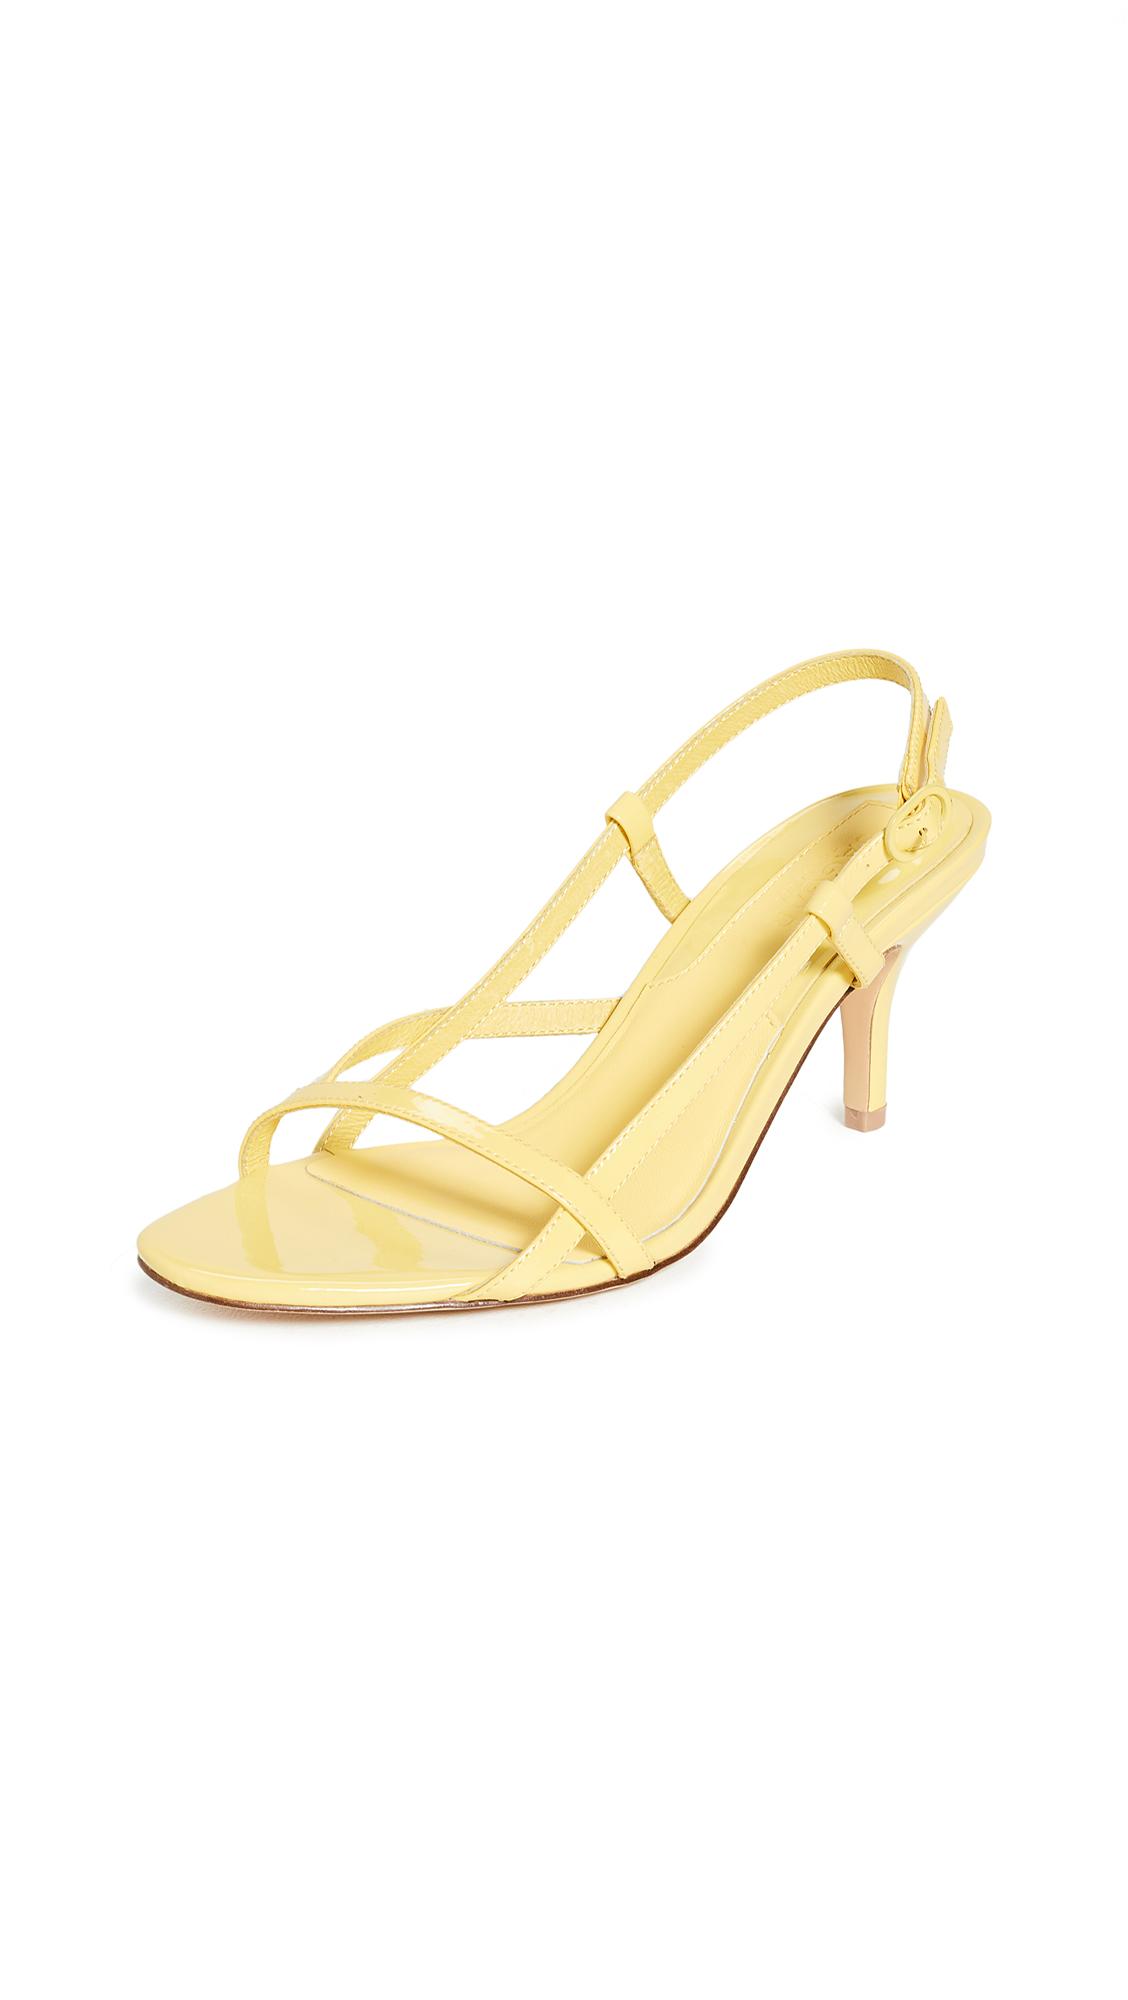 Buy JAGGAR Harness Sandals online, shop JAGGAR